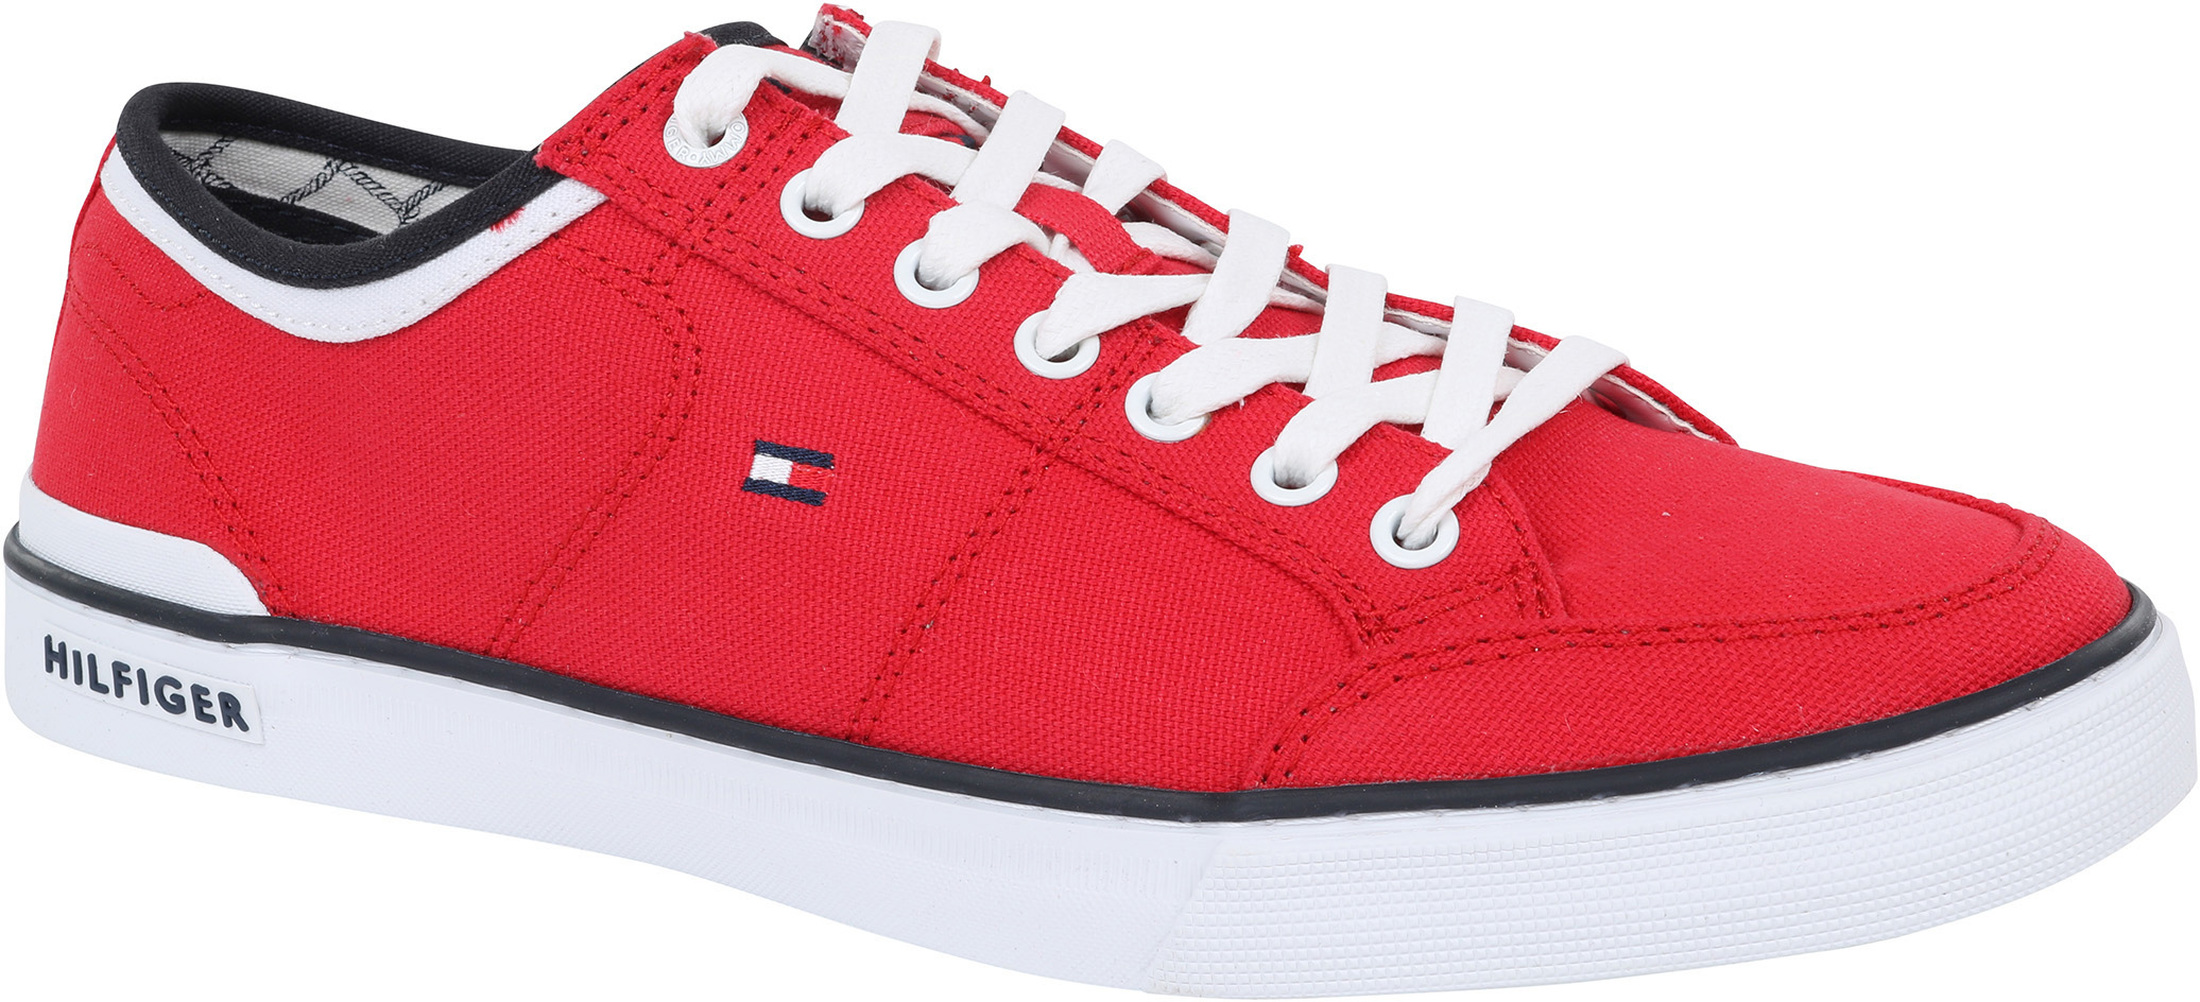 Tommy Hilfiger Core Corporate Sneaker Rood foto 0